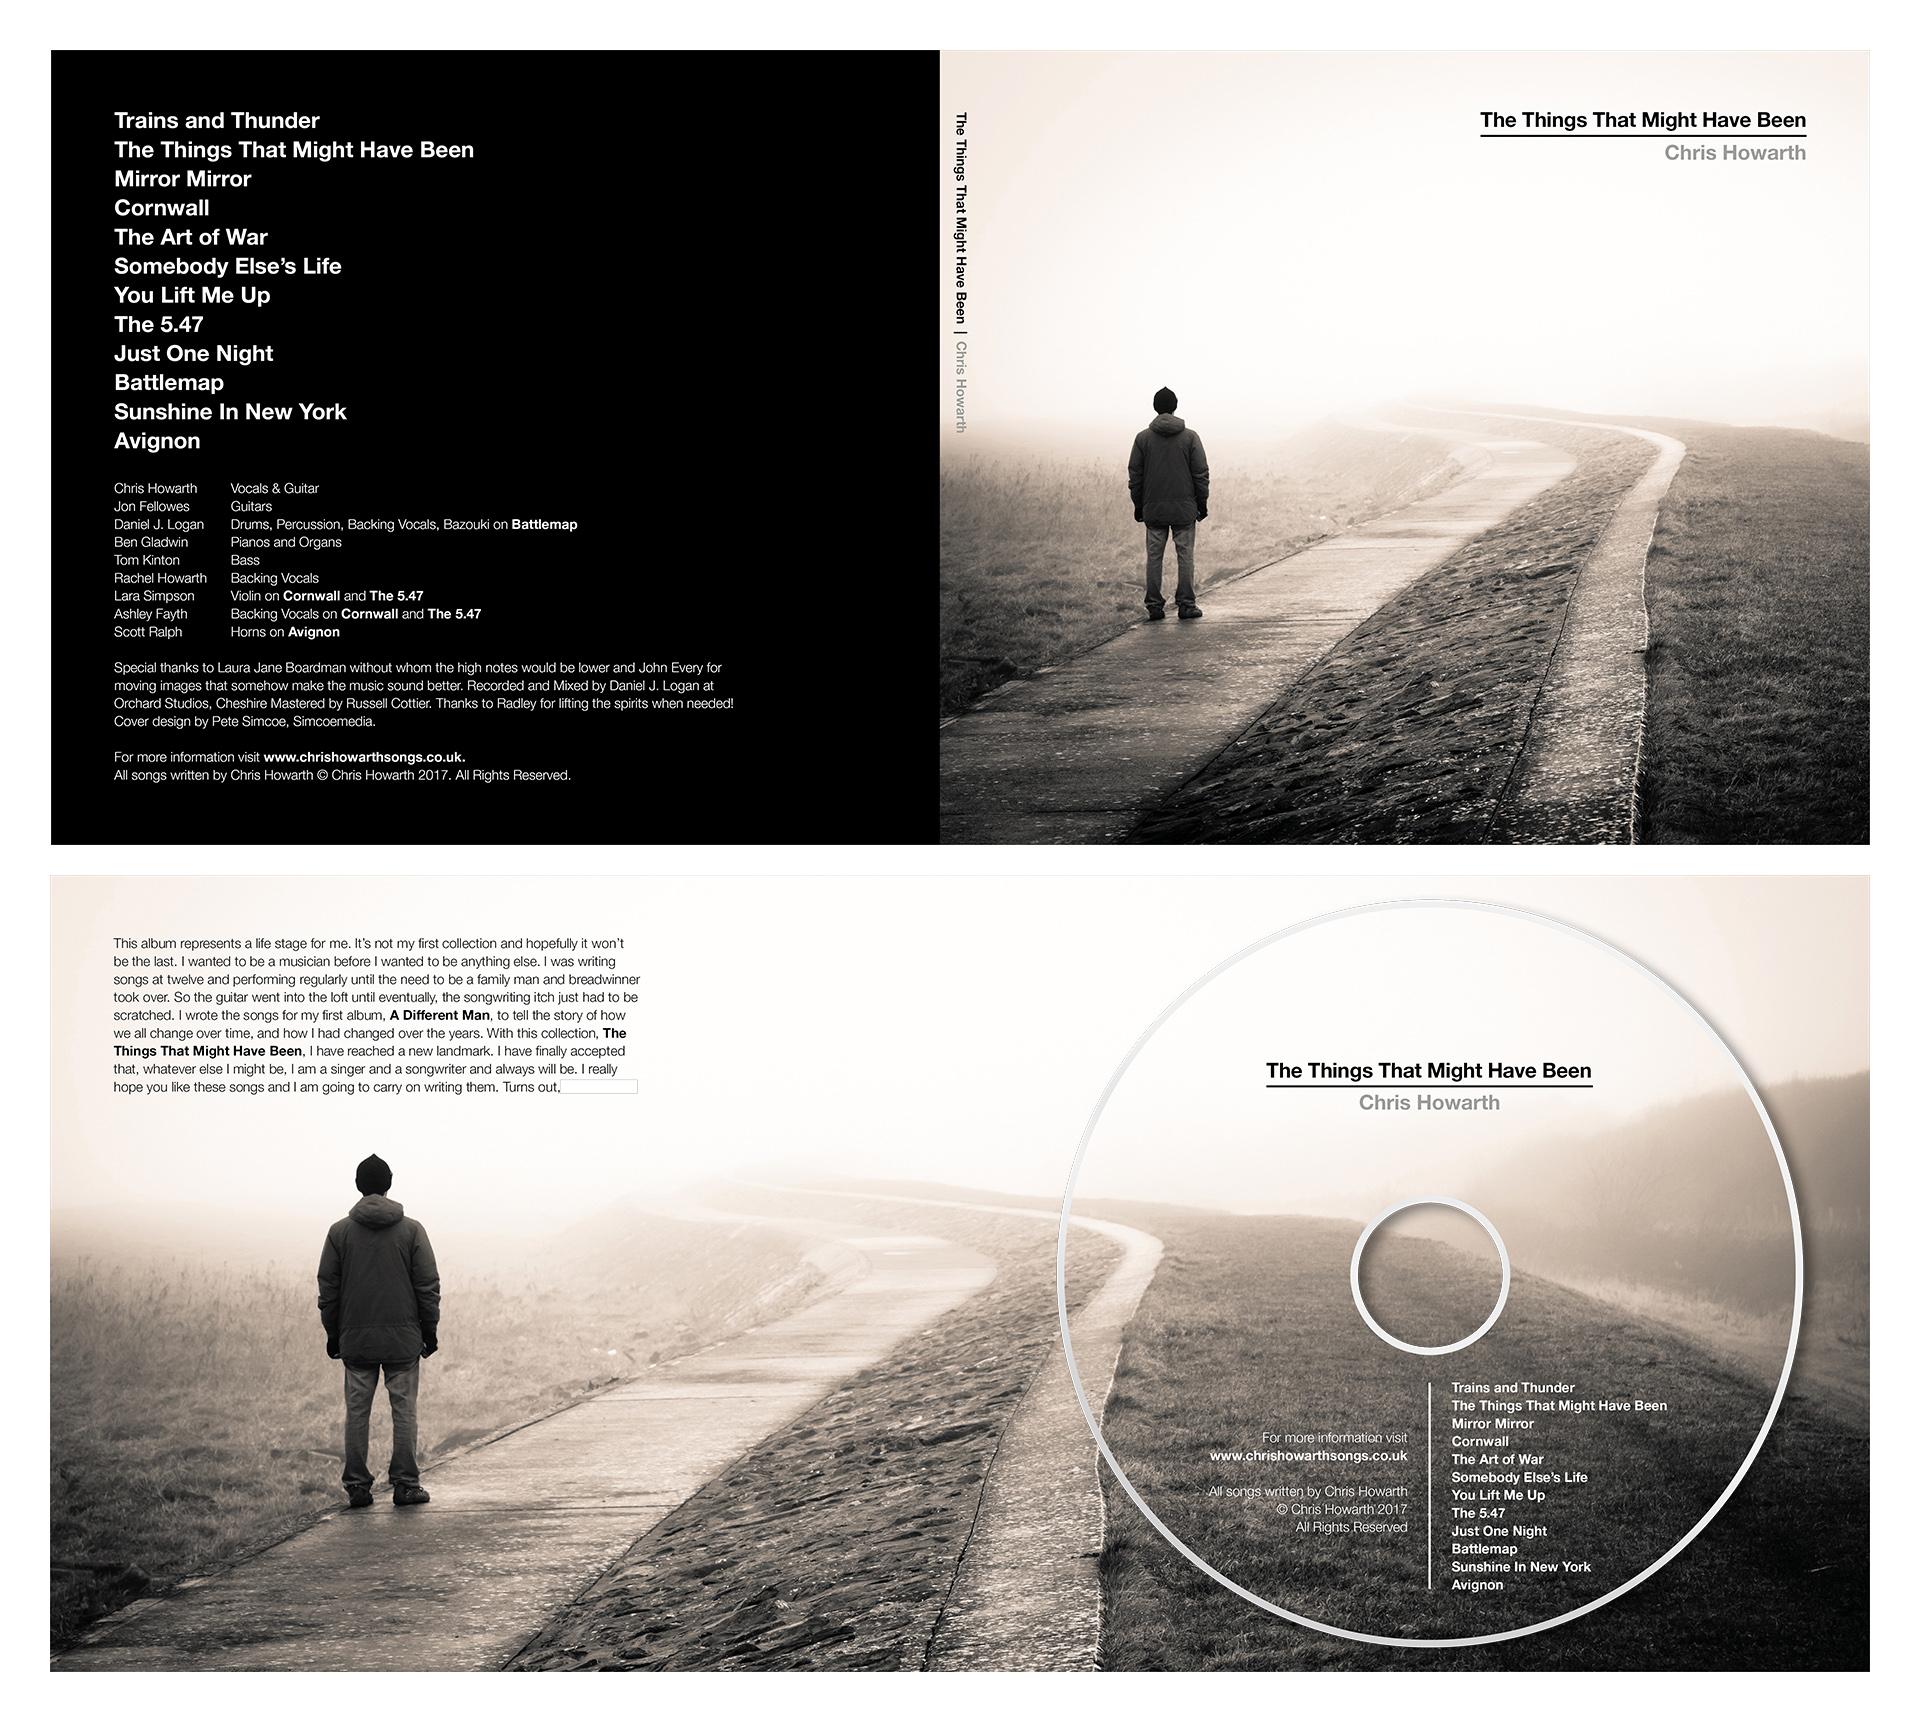 Chris Howarth Artwork and Design for CD